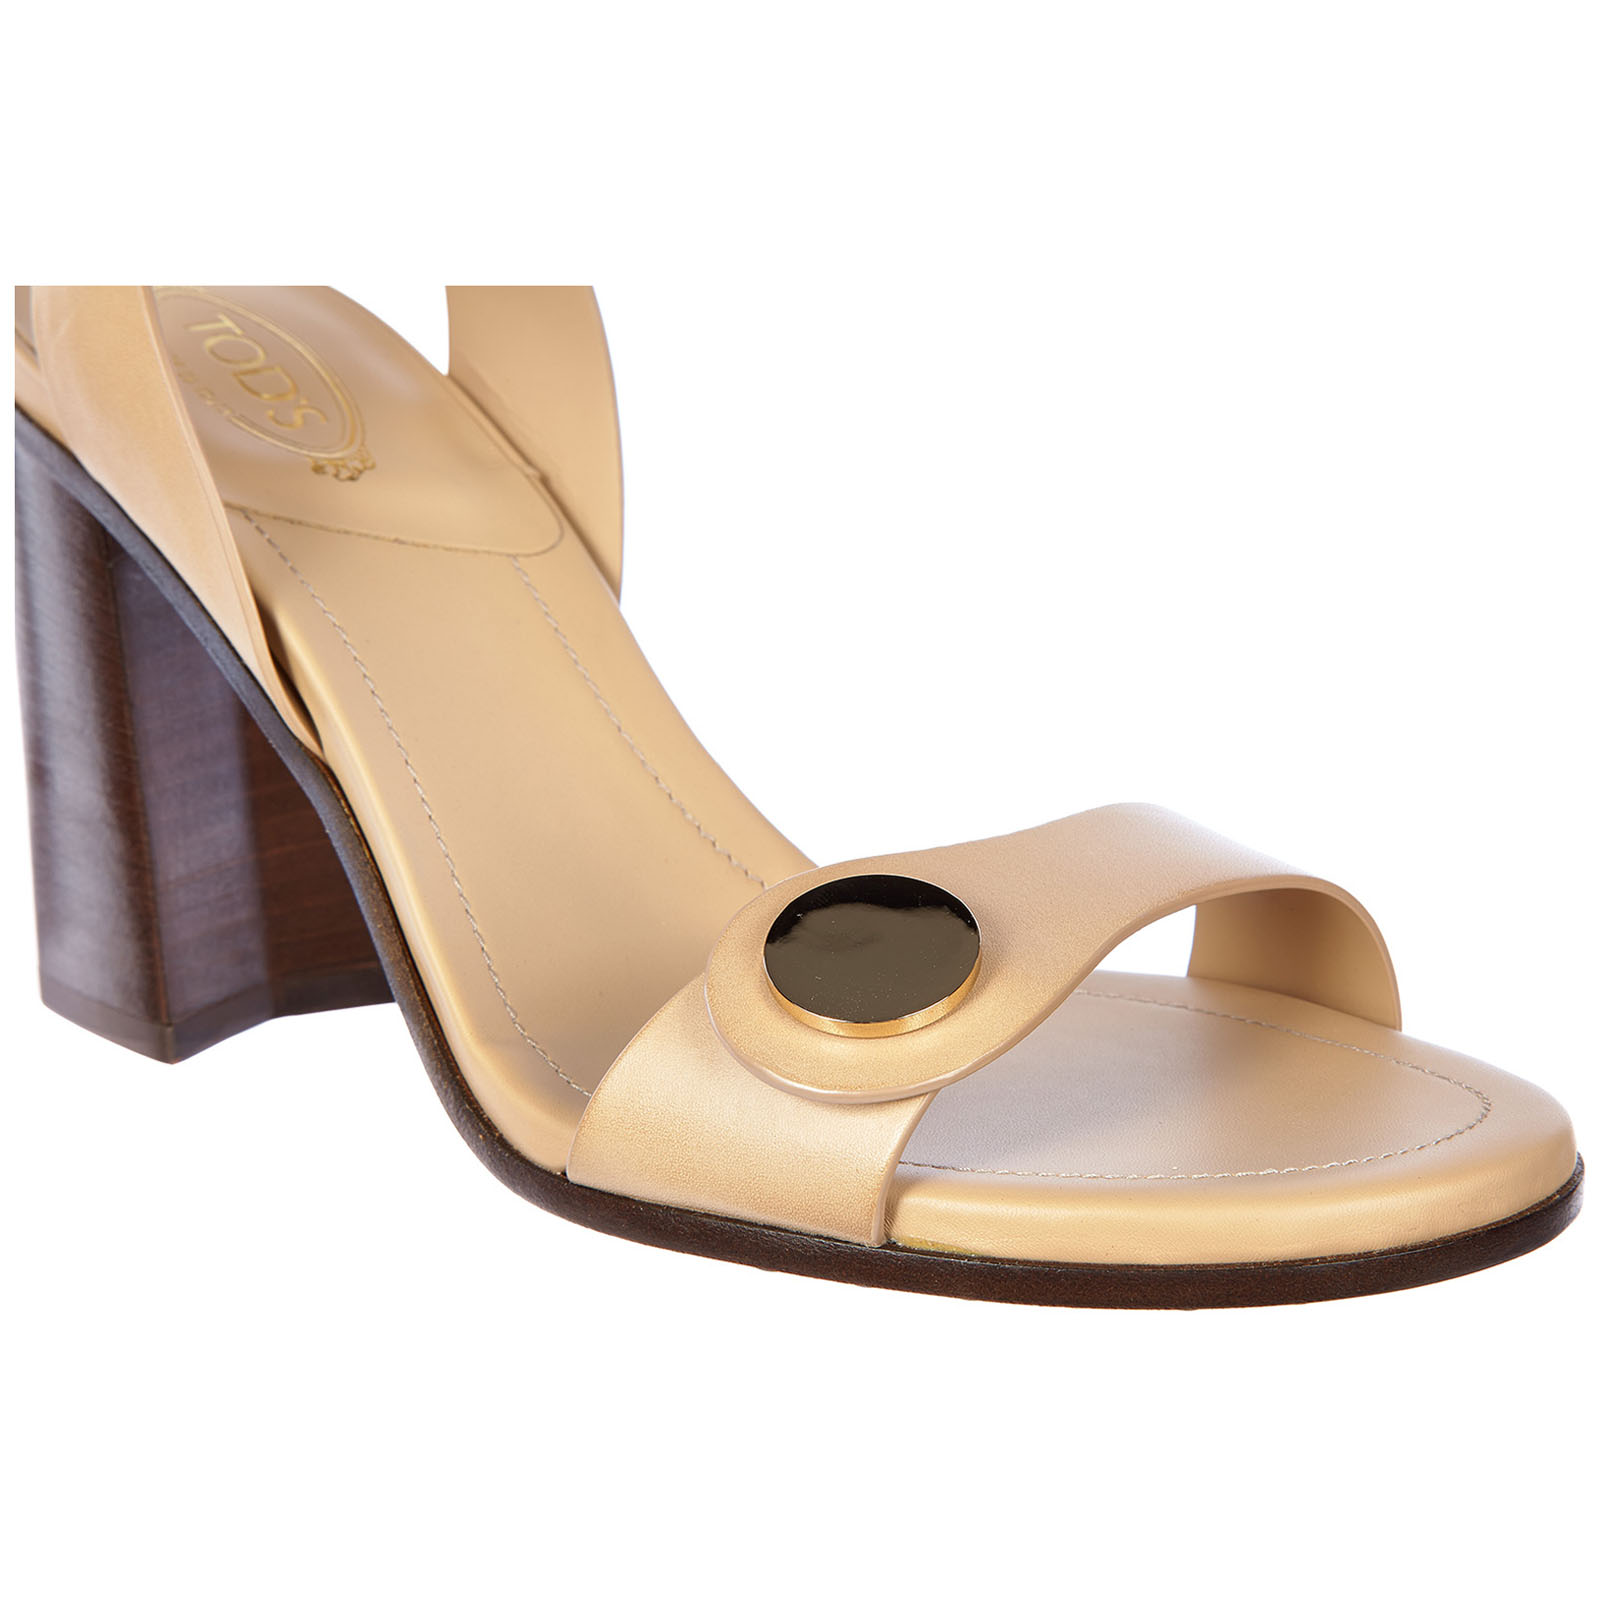 Women's leather heel sandals t90 cinturino bottone